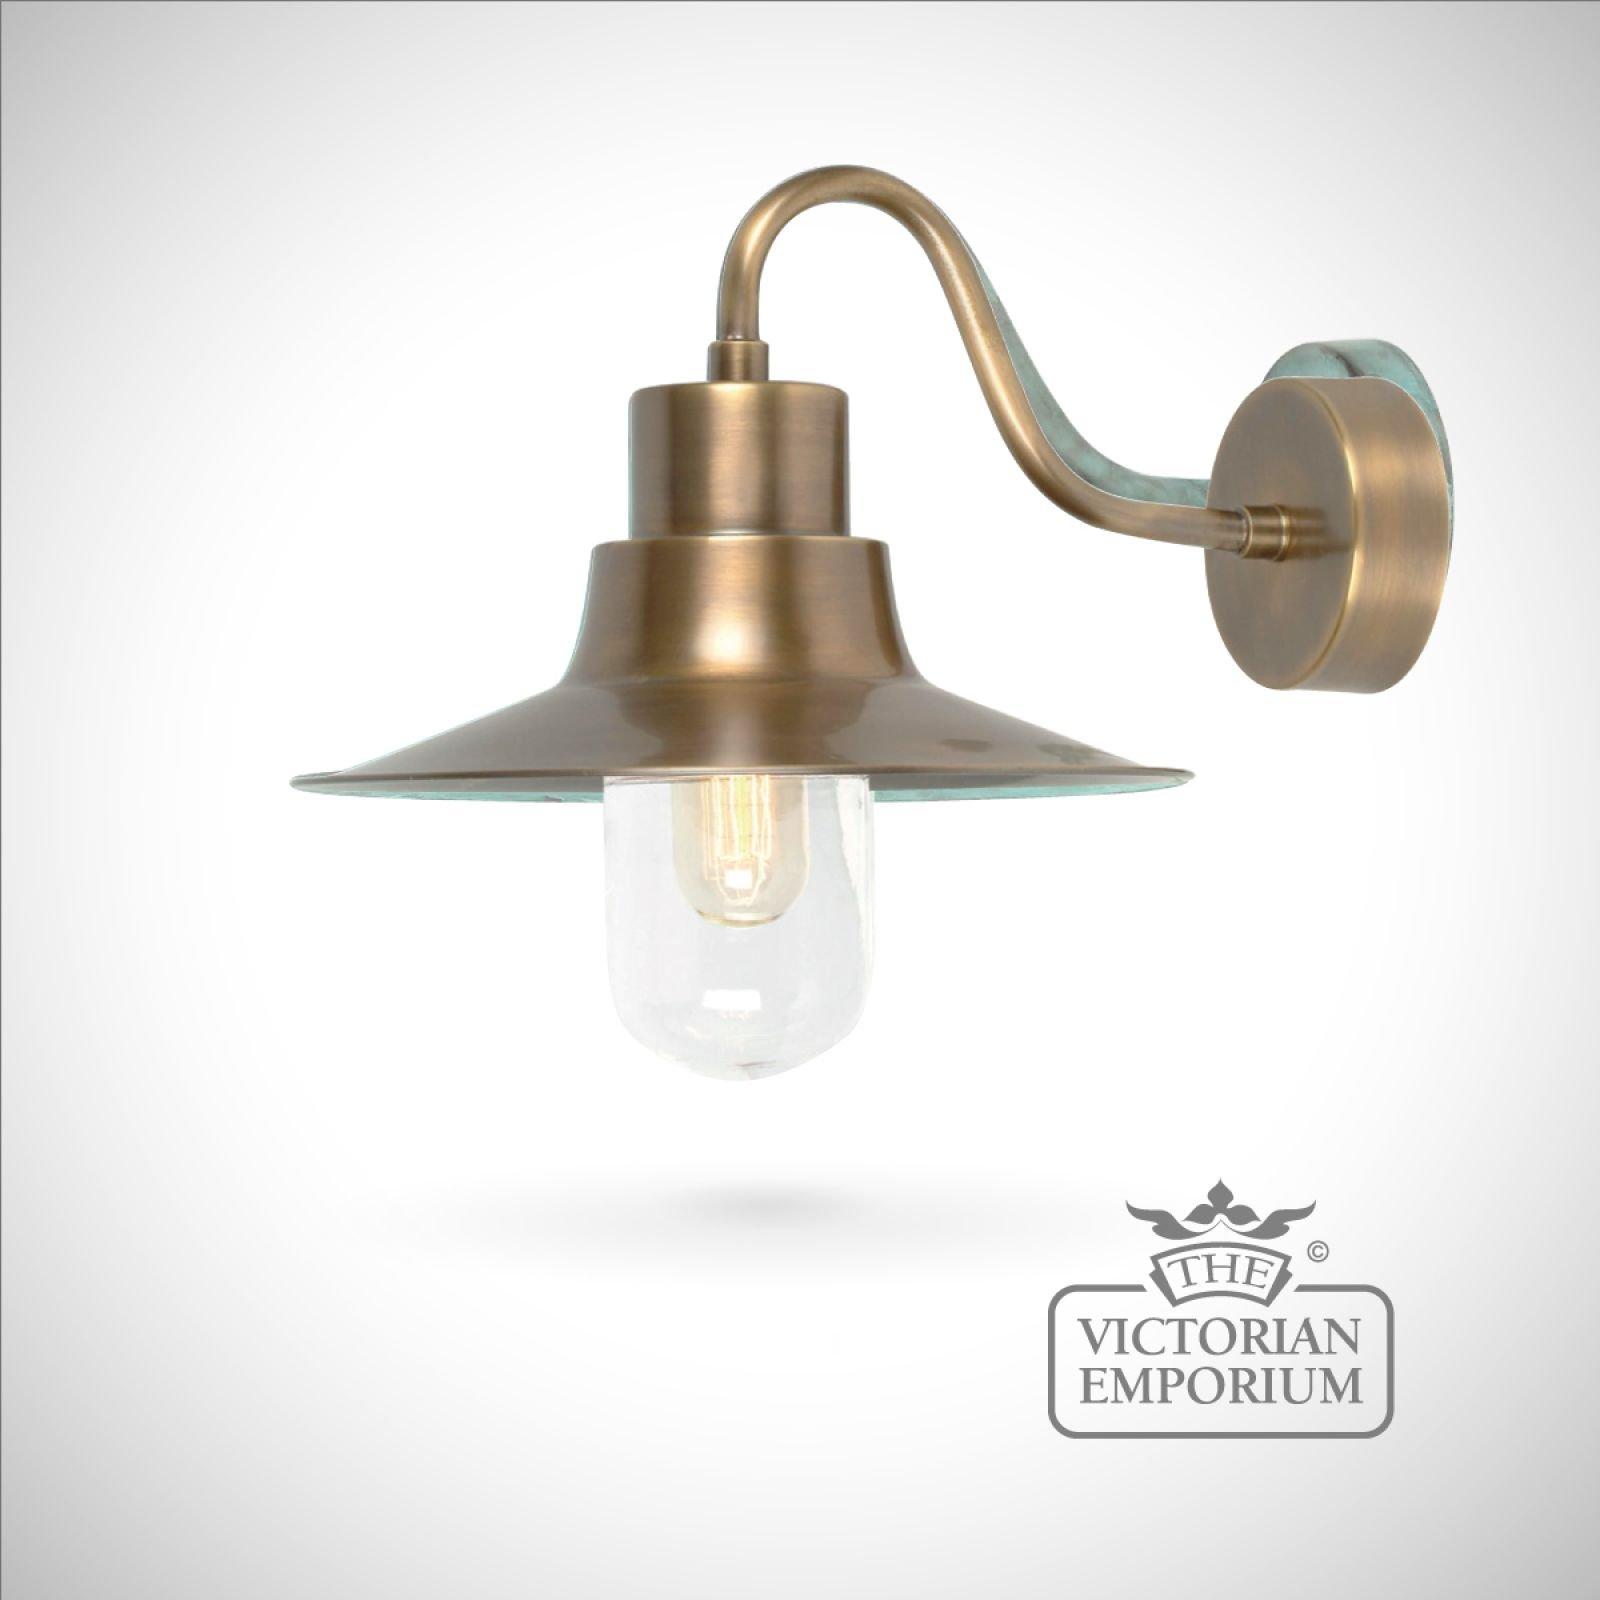 Brass lantern lights